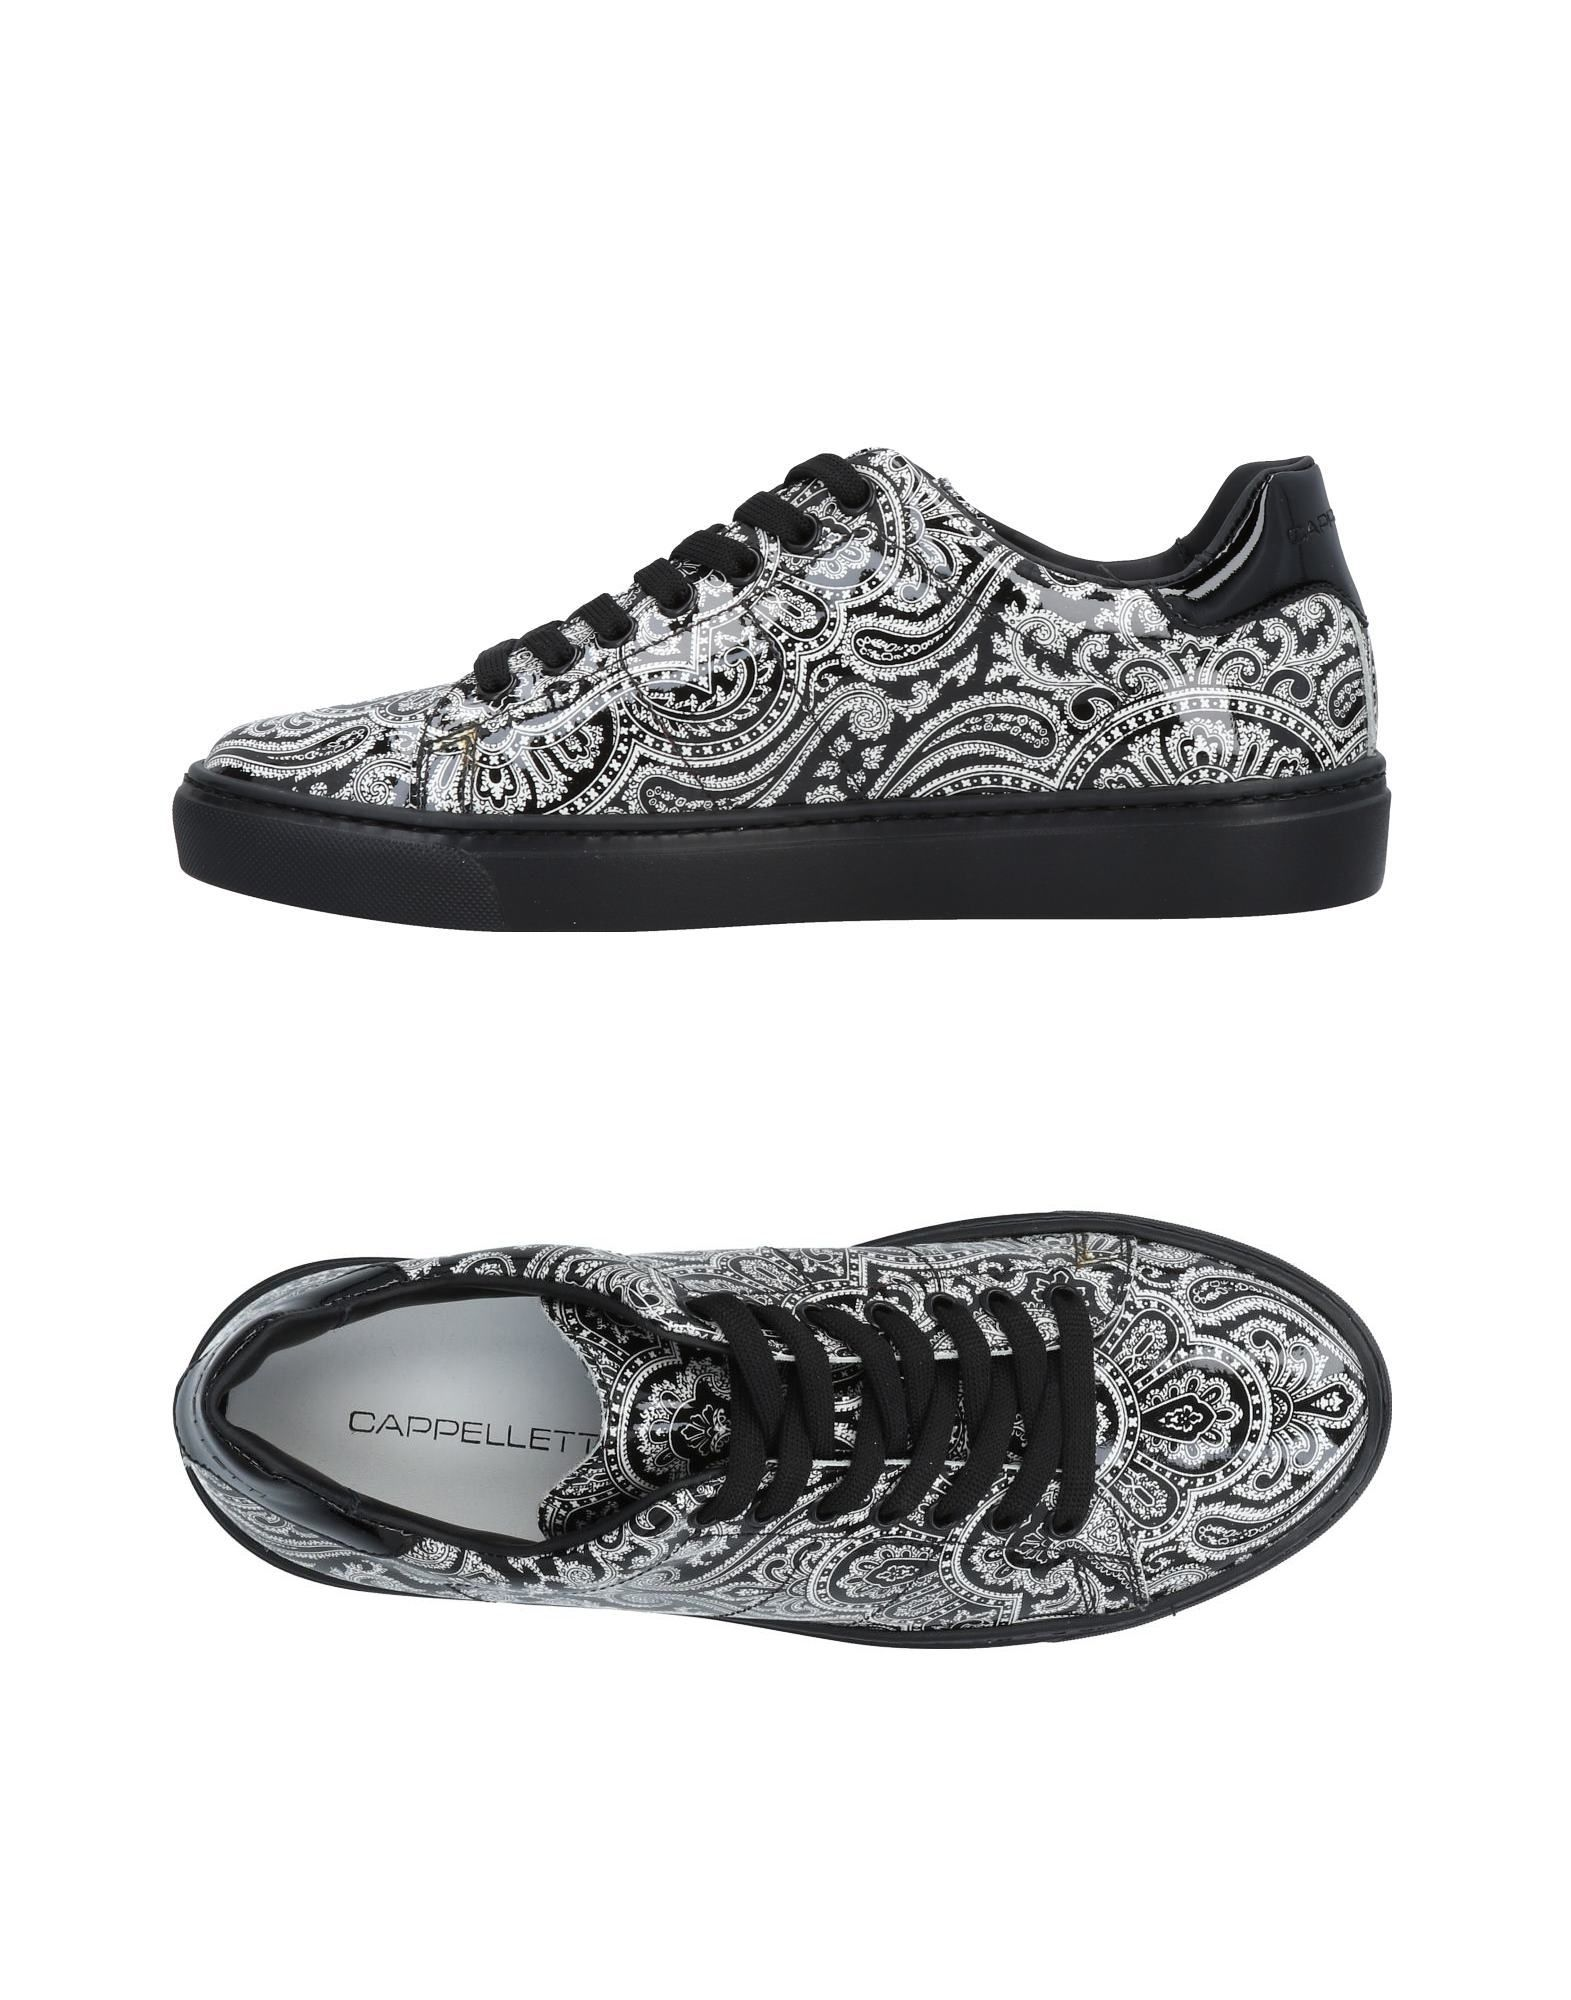 CAPPELLETTI Sneakers in Black